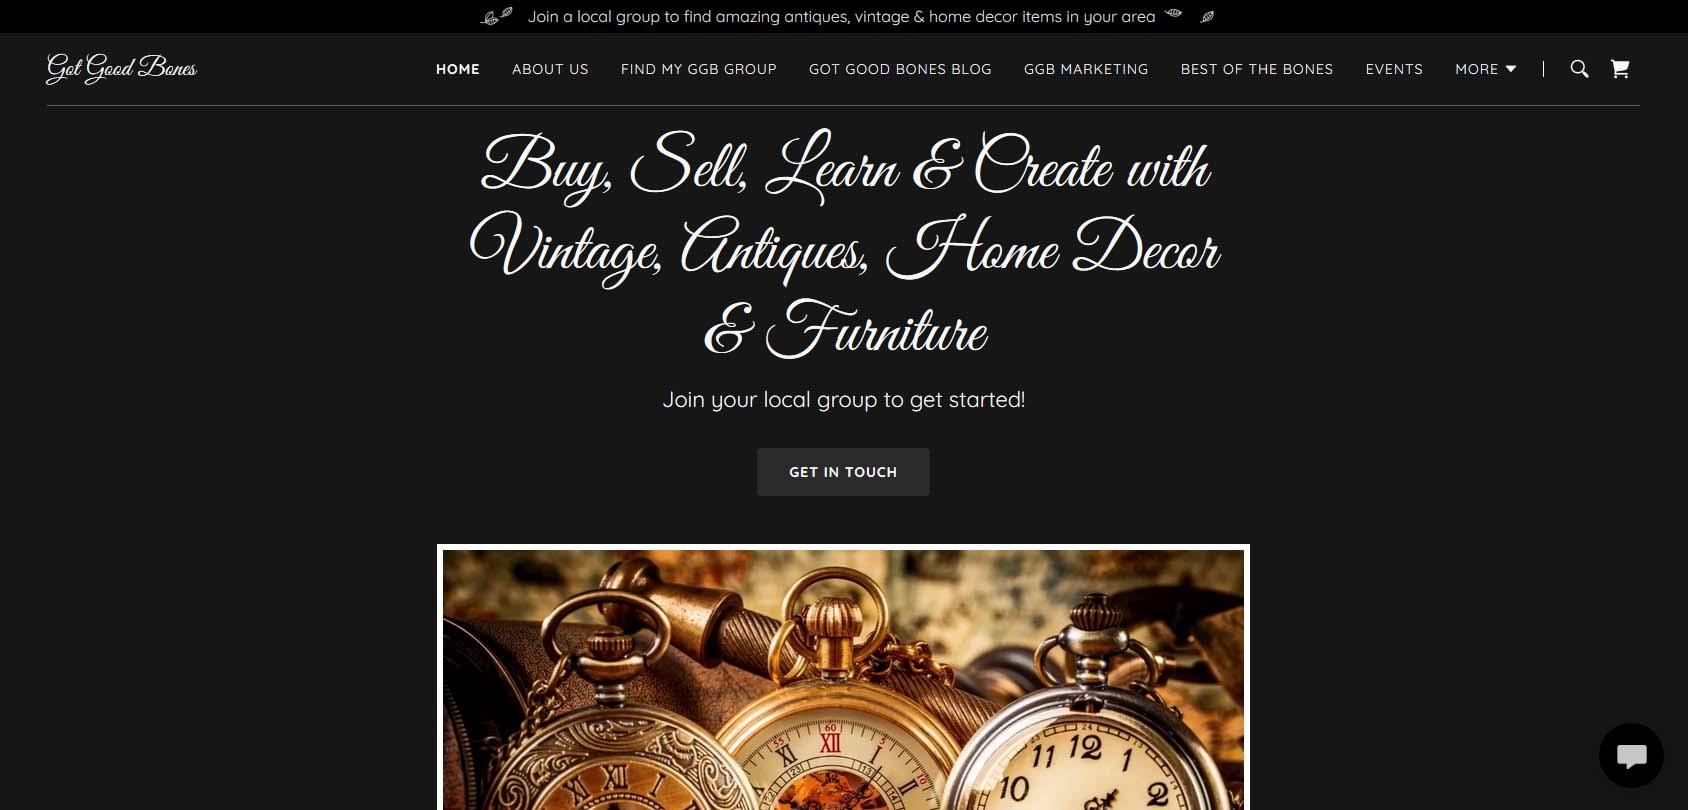 Got Good Bones Homepage